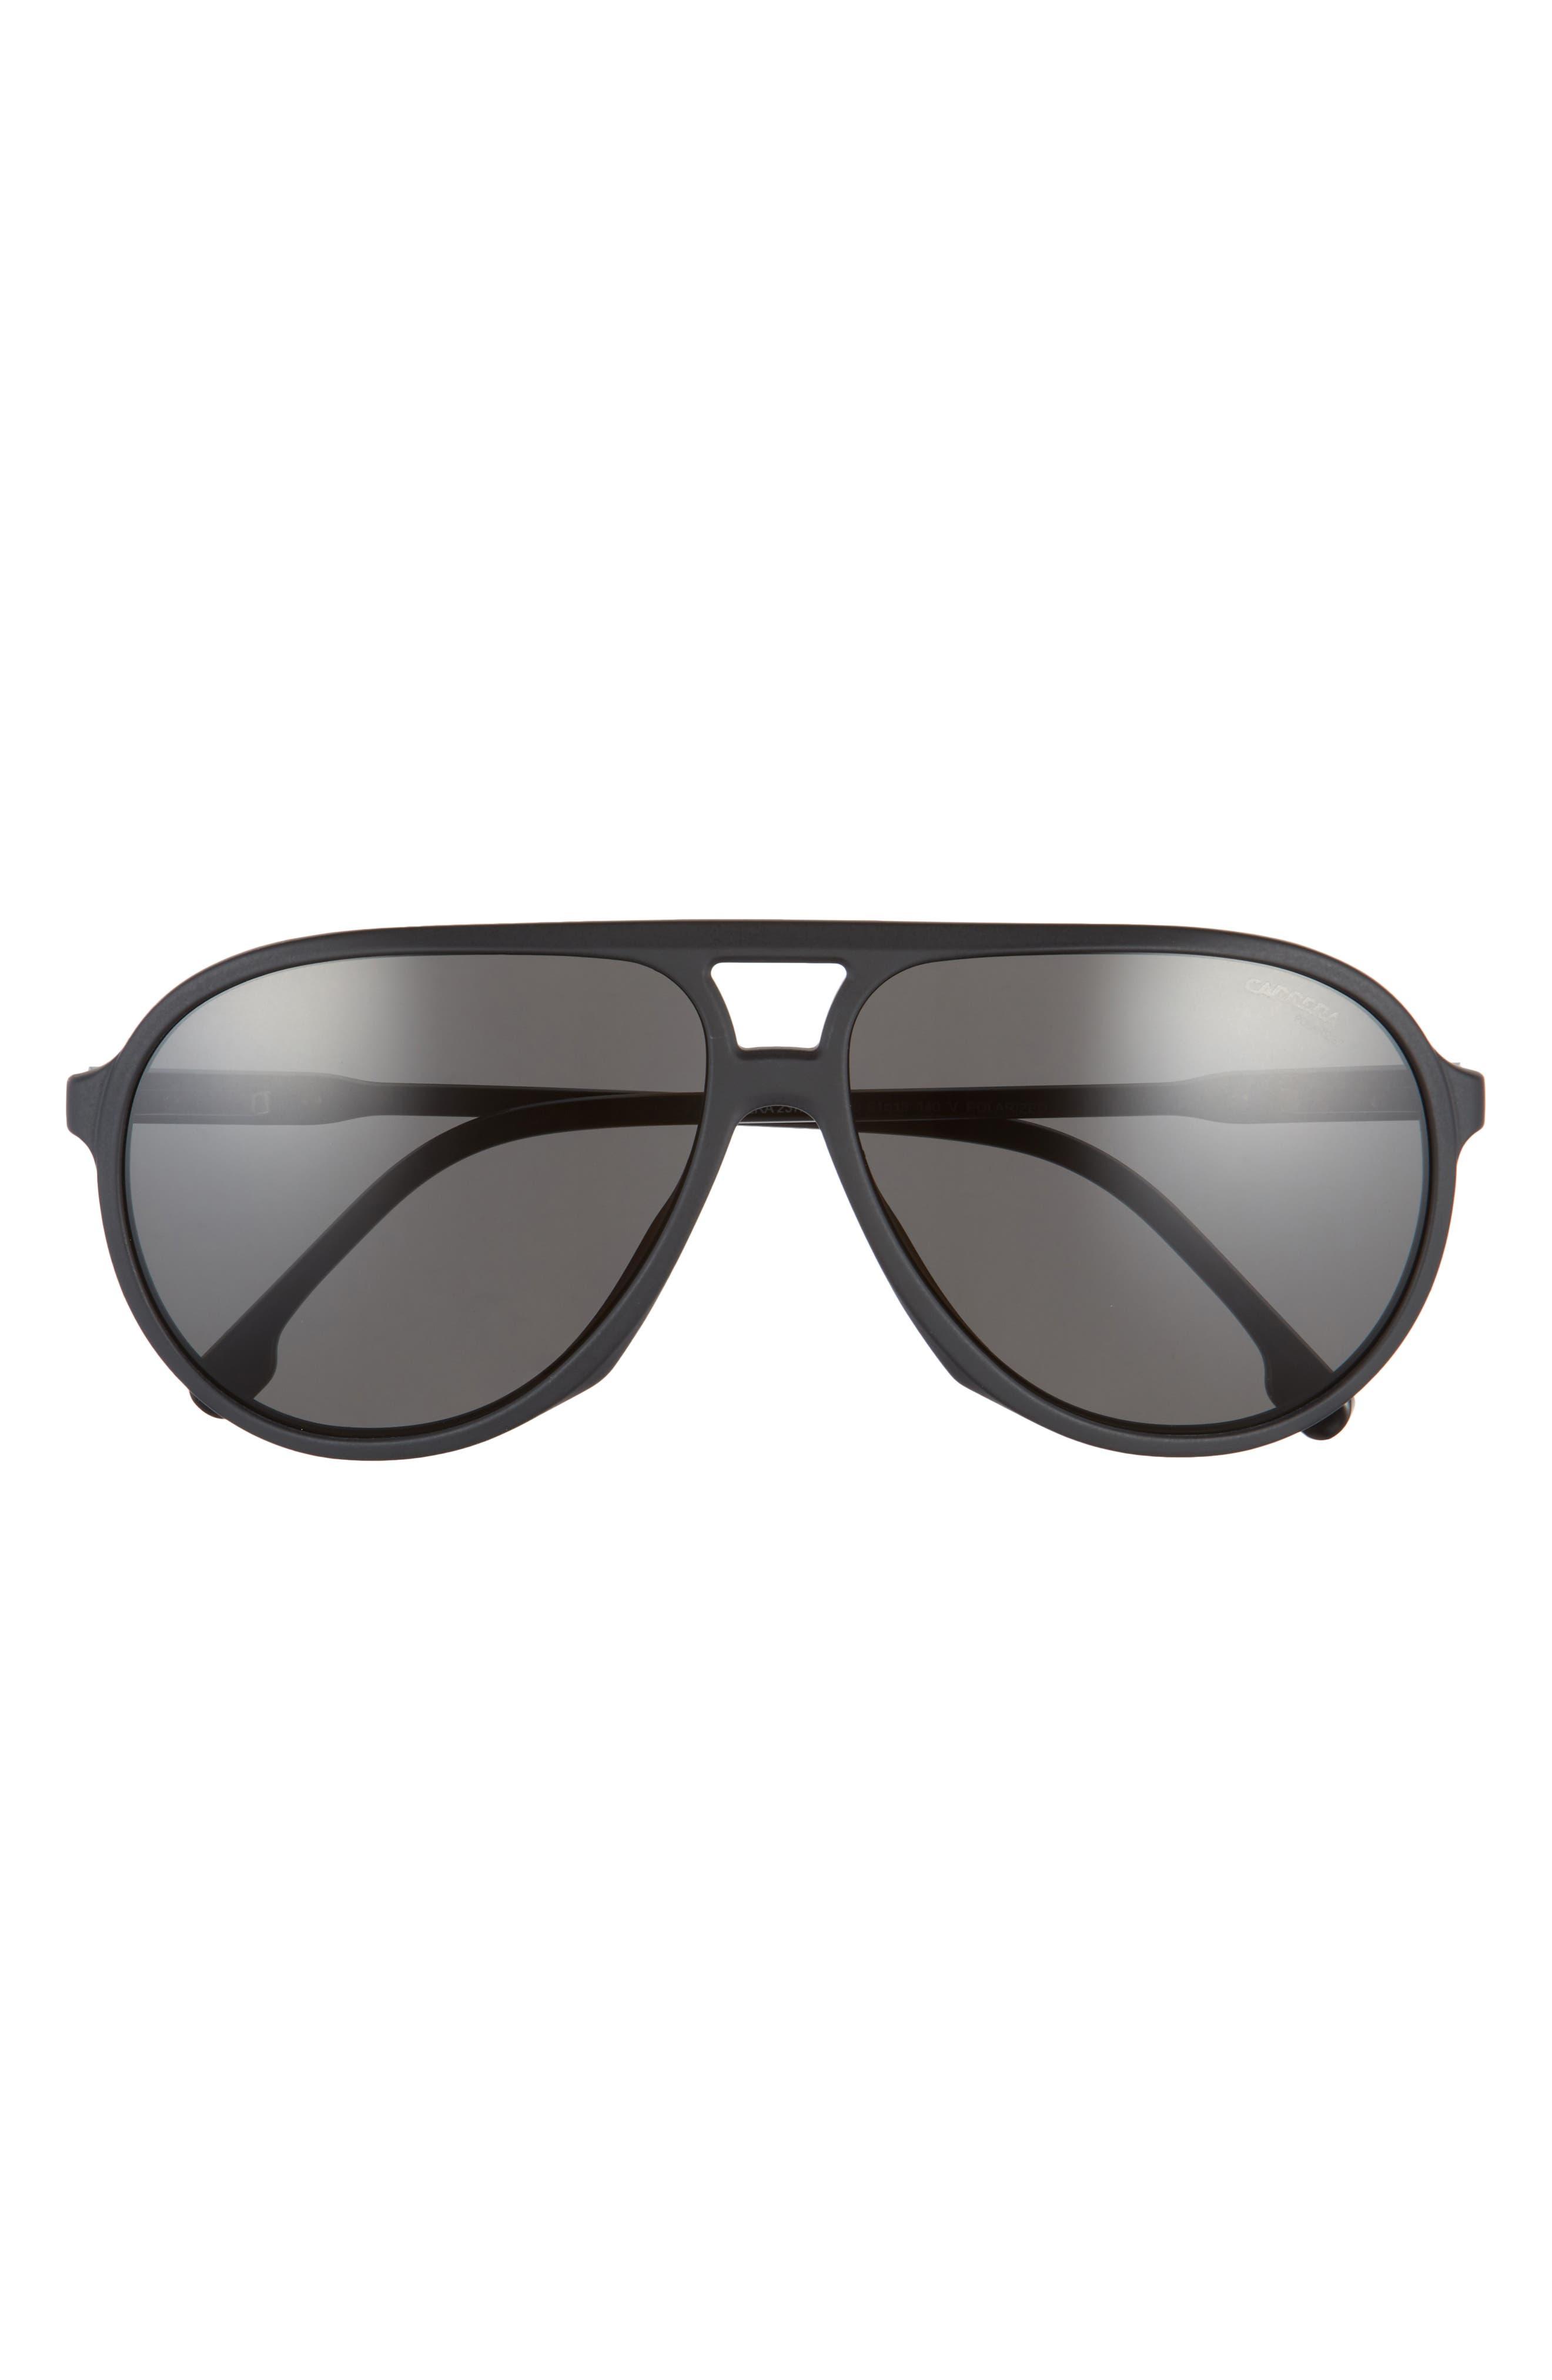 Men's Carrera 61mm Aviator Sunglasses